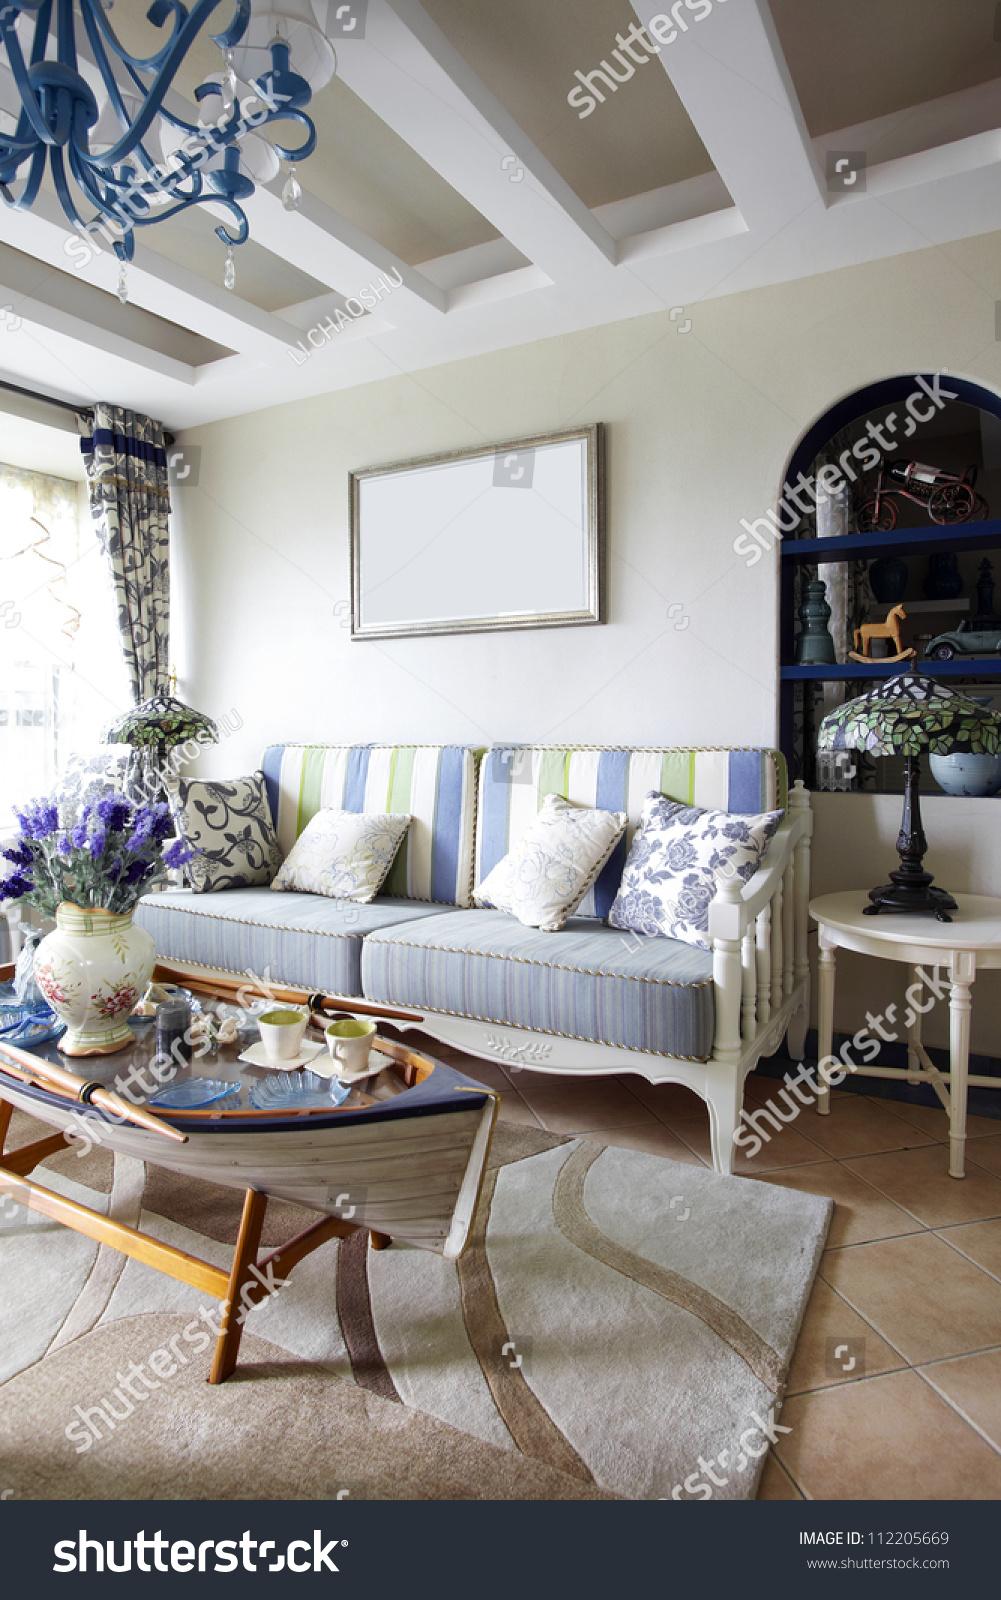 Mediterranean style living room stock photo 112205669 shutterstock for Mediterranean inspired living room